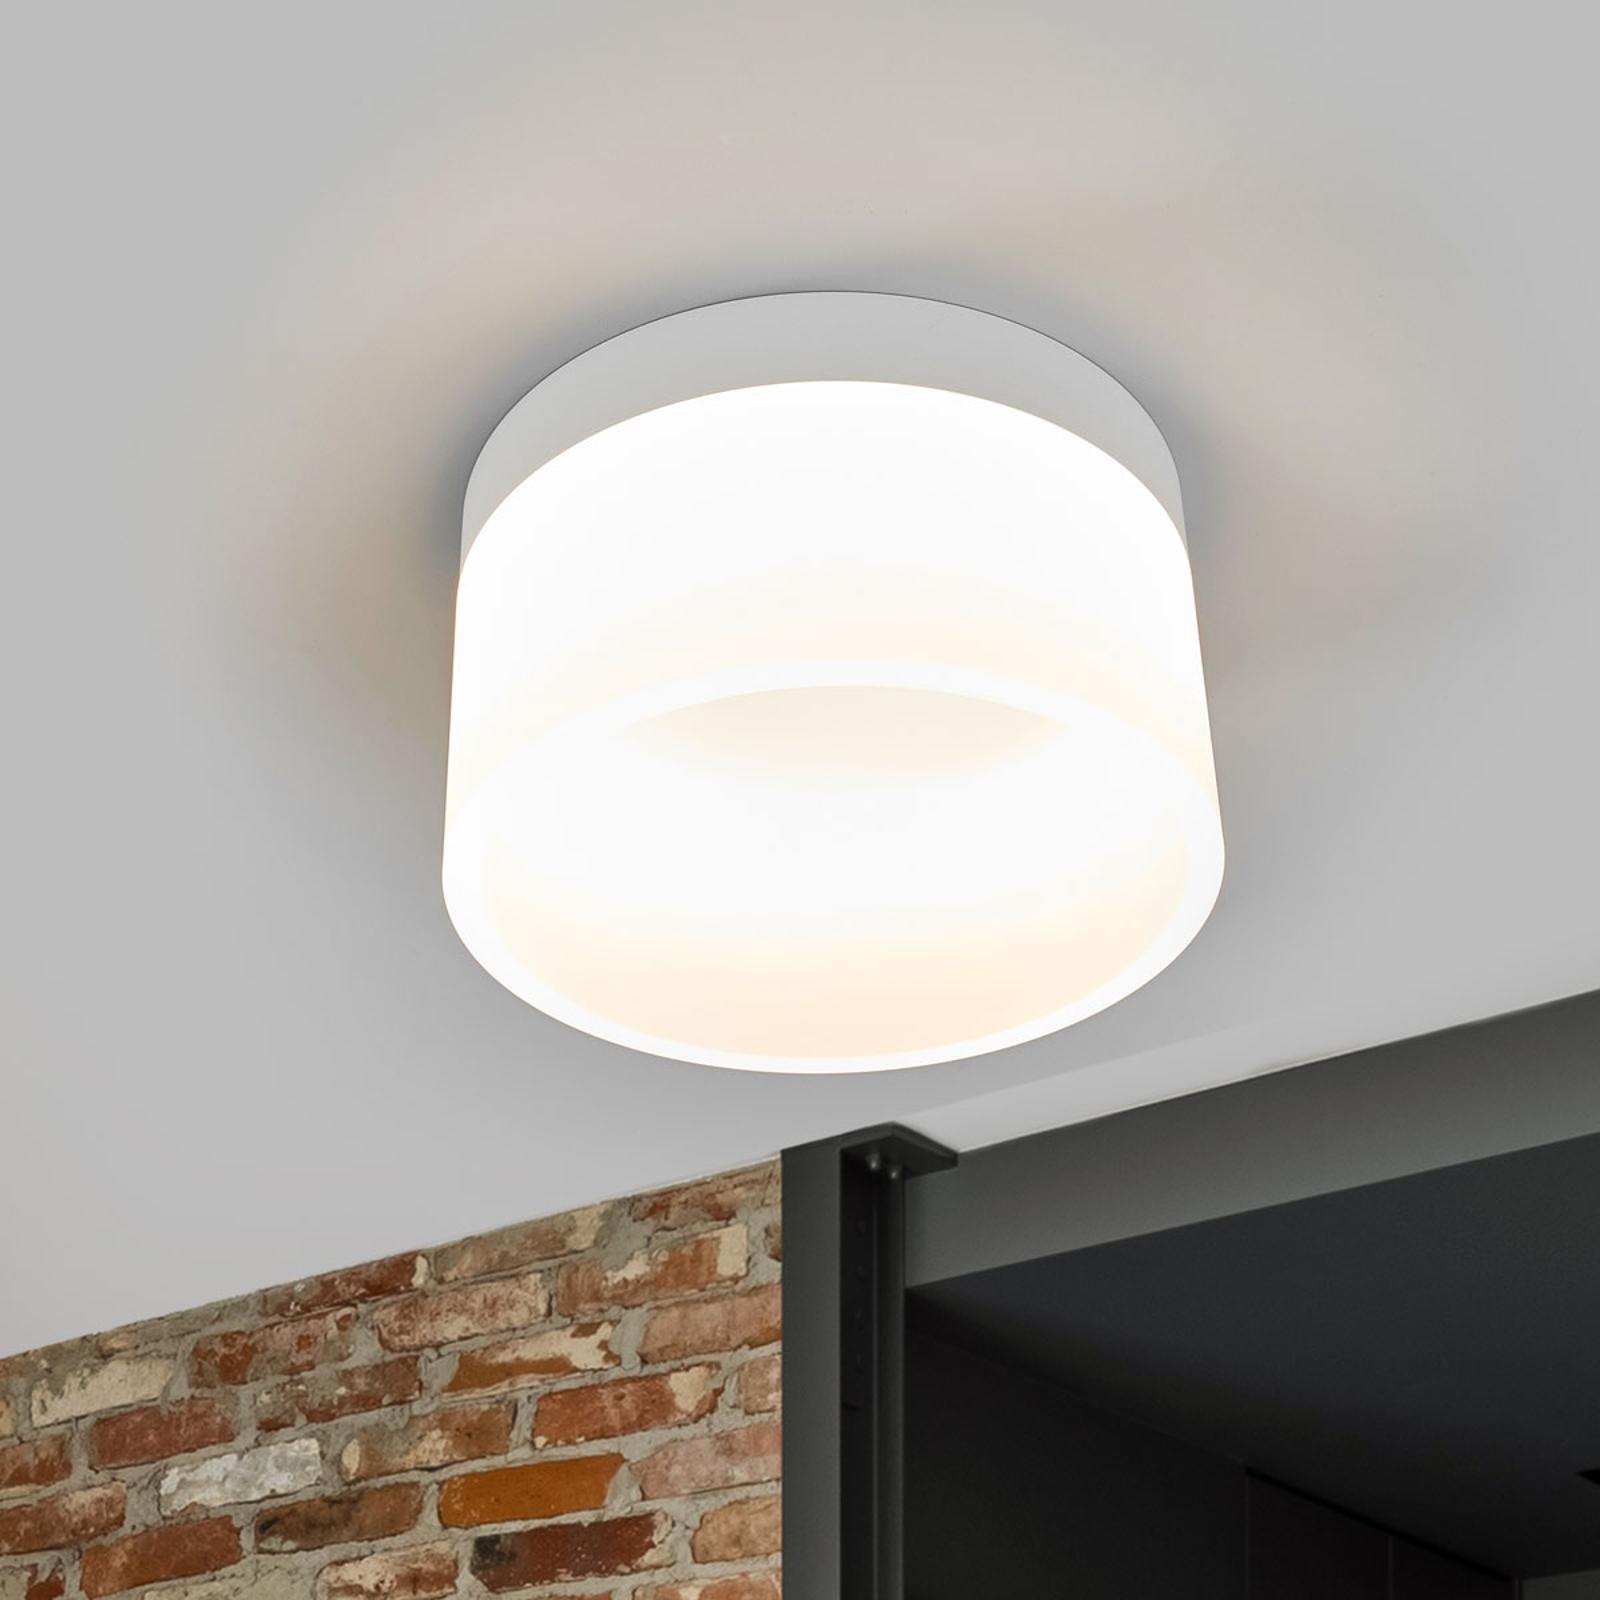 Niezwykle piękna lampa sufitowa LED Liv